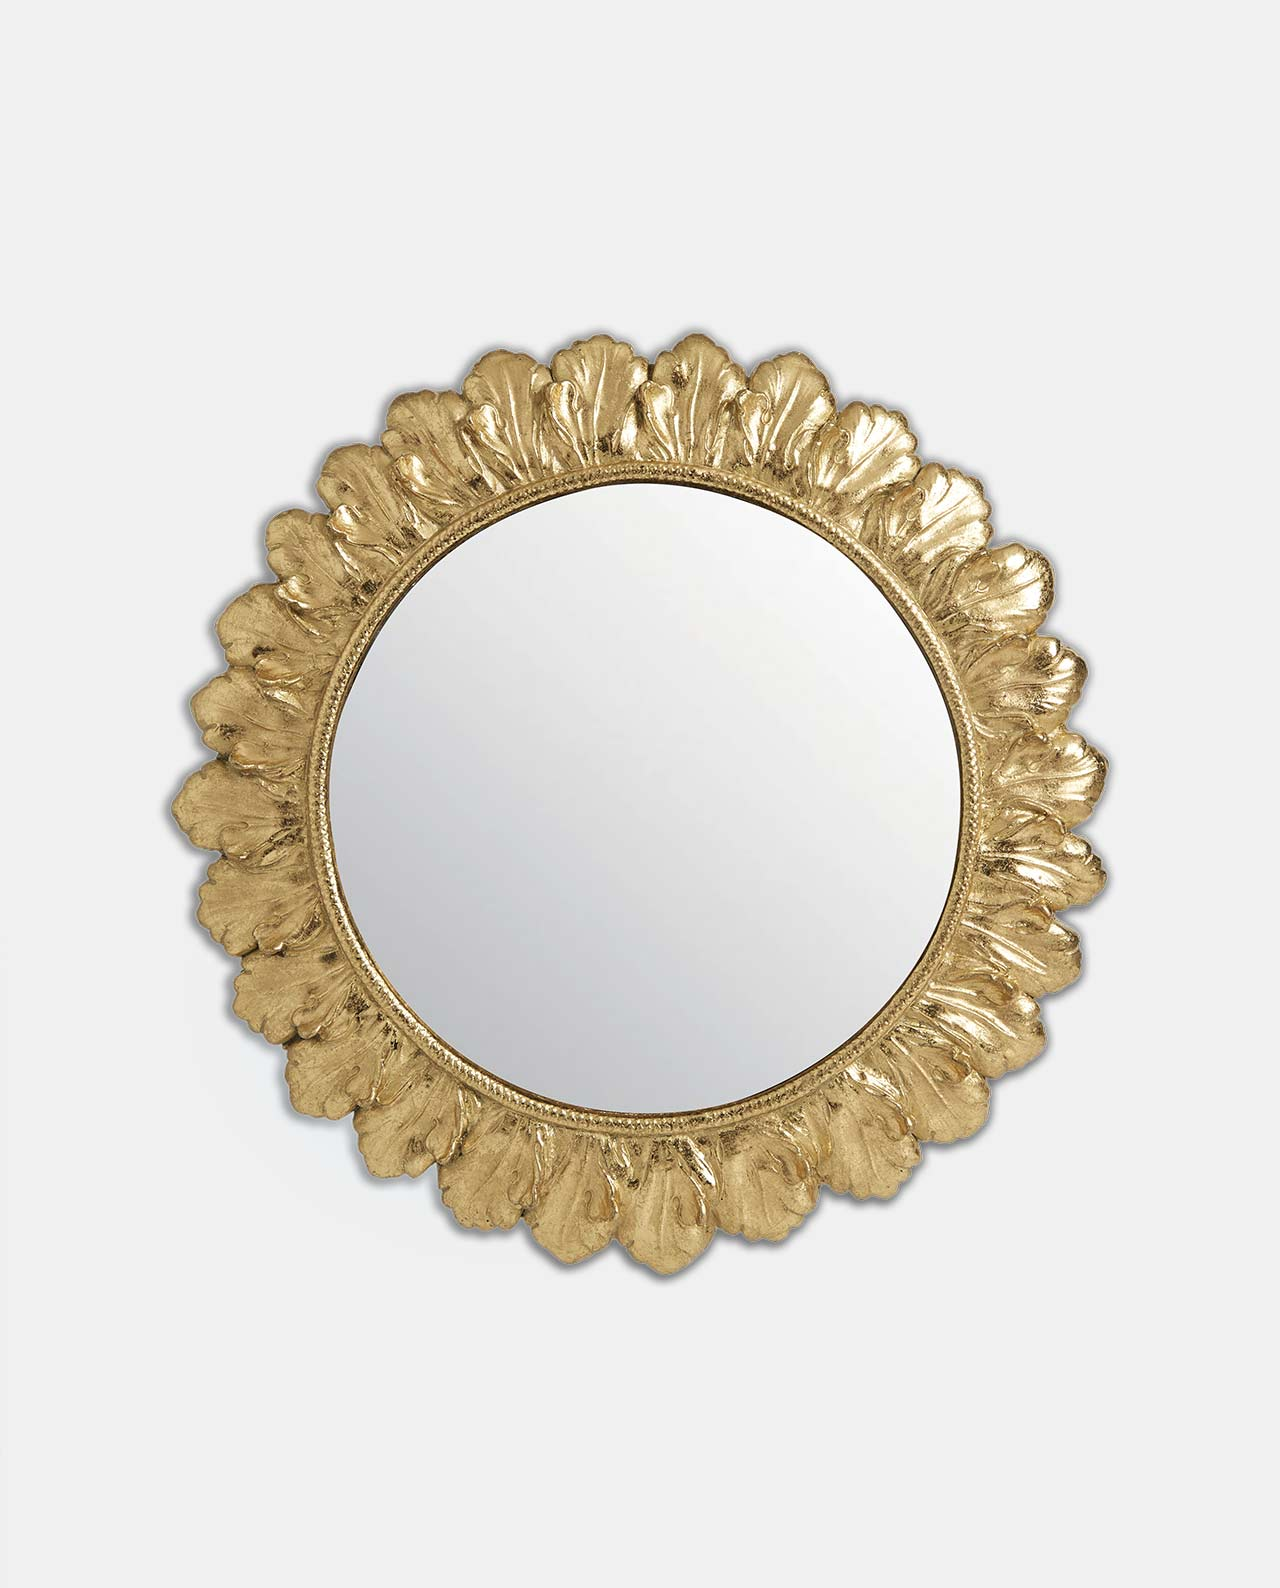 Gold Round Floral Design Convex Mirror 23cm